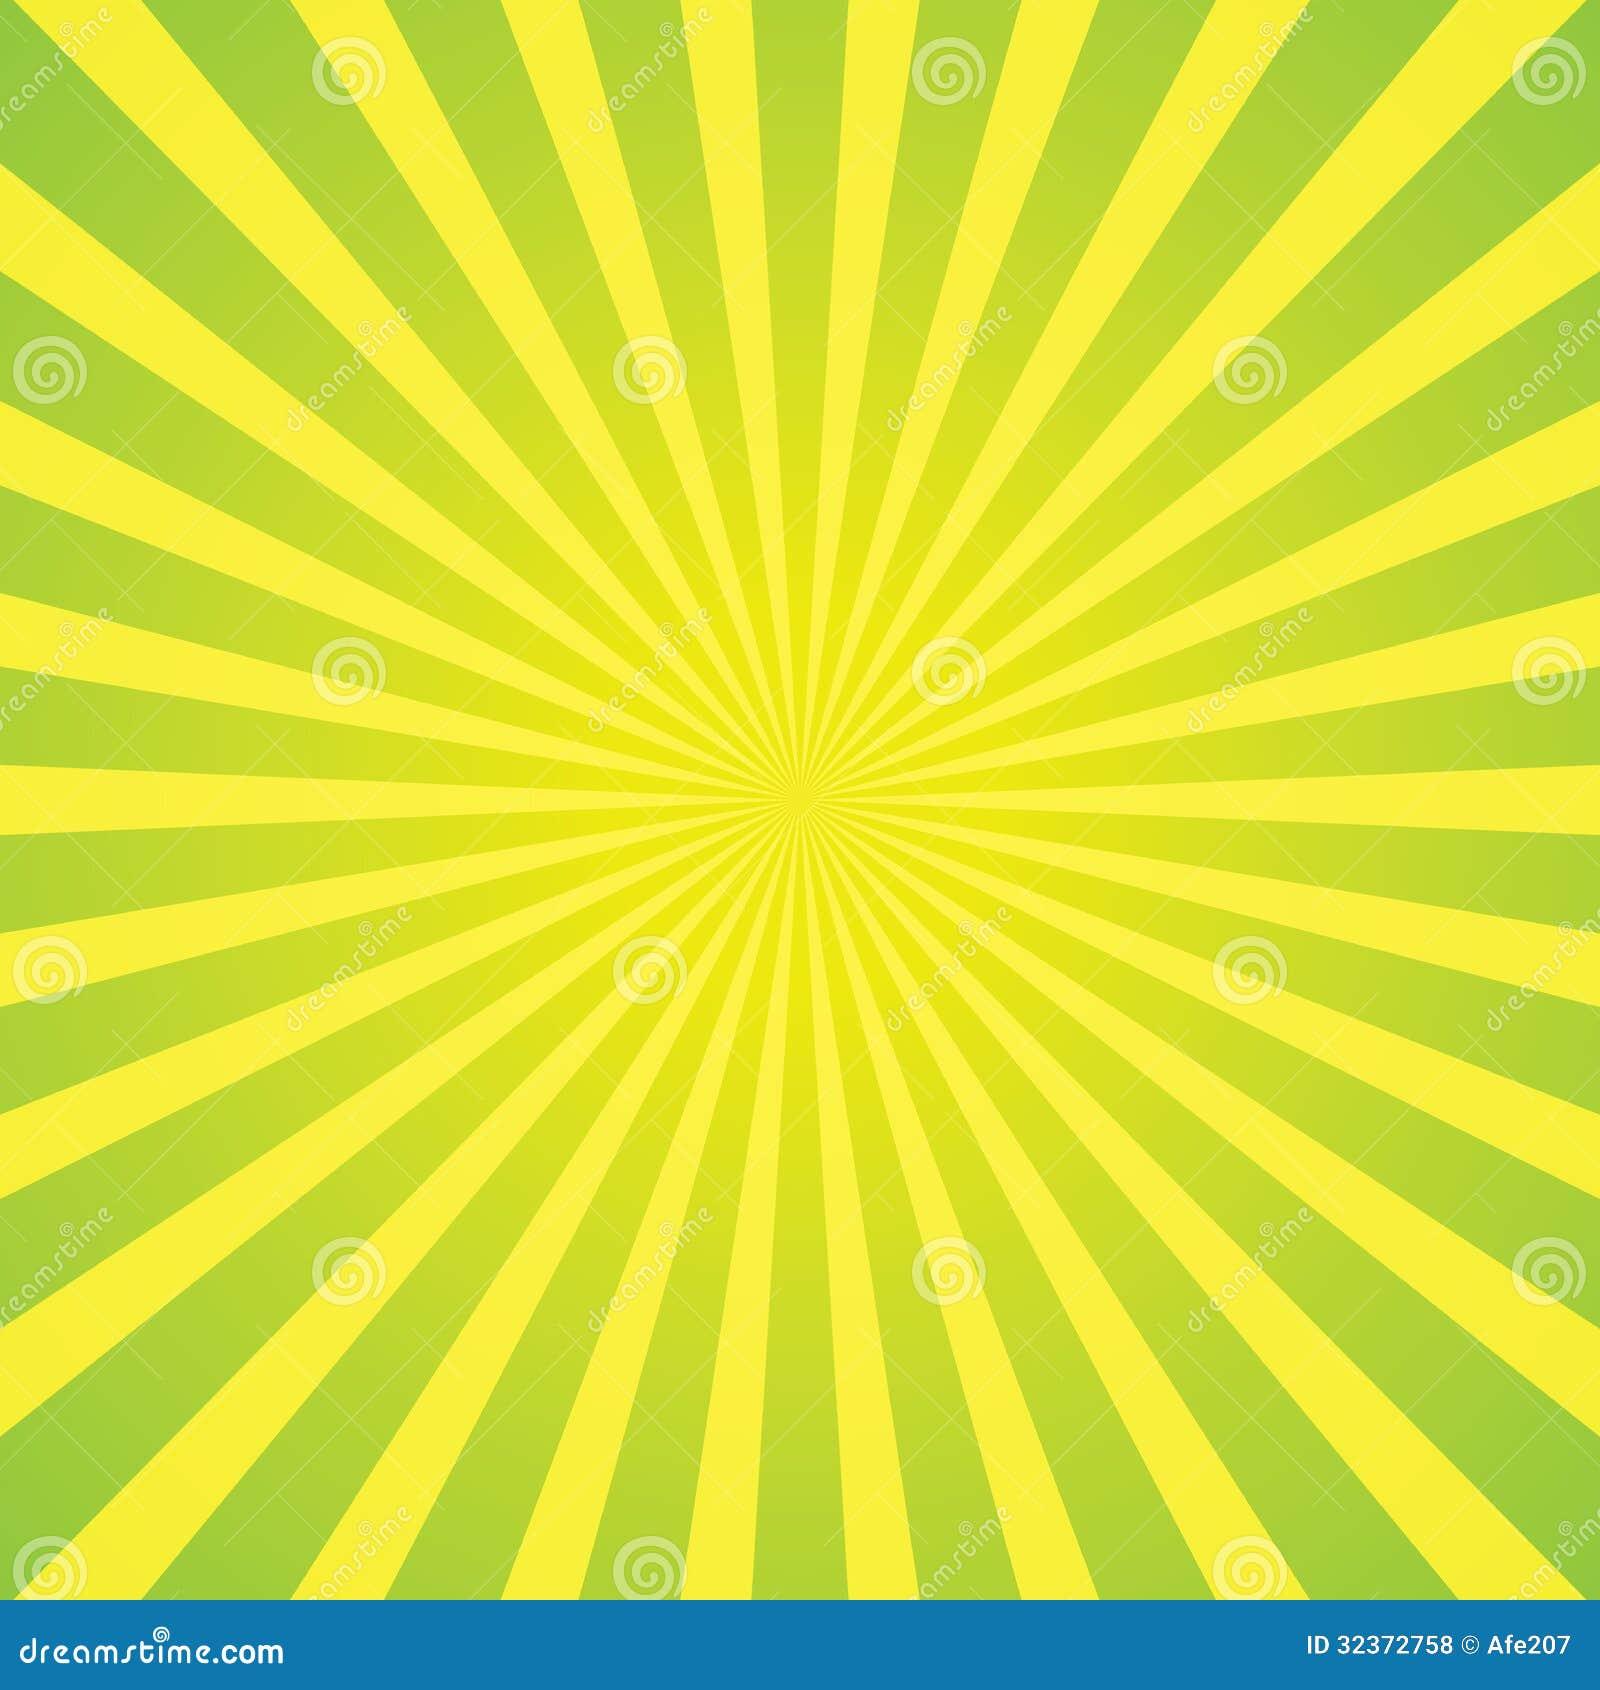 green rays background - photo #4